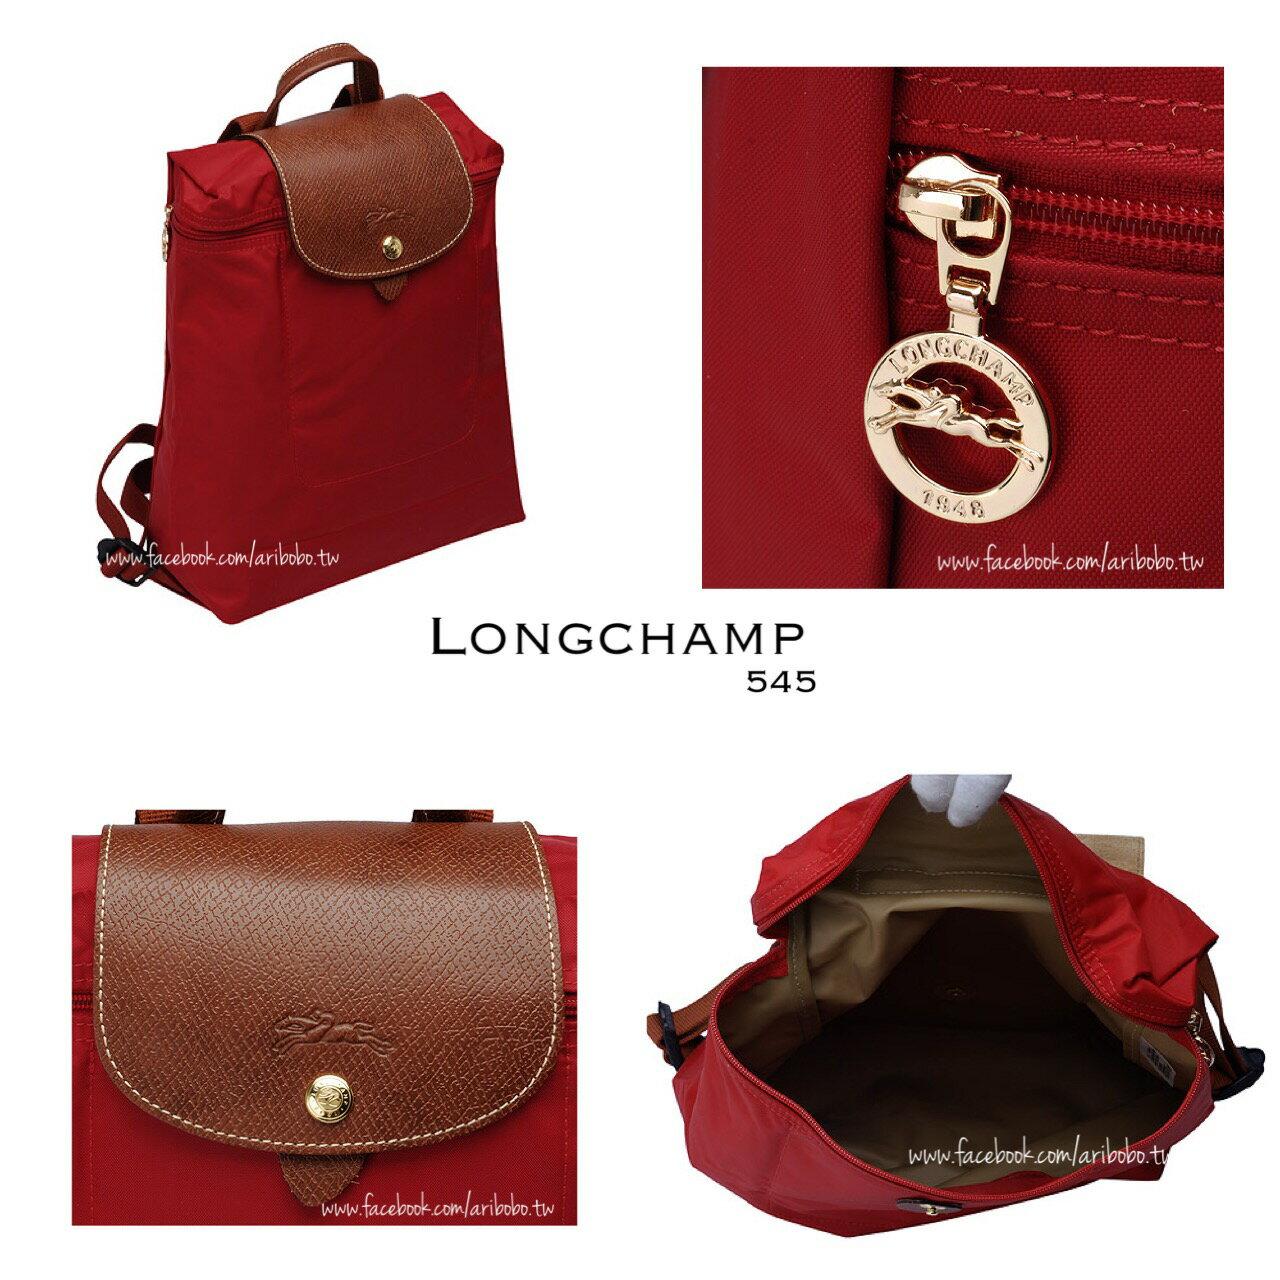 【LONGCHAMP】 LE PLIAGE 紅色折疊後背包 3